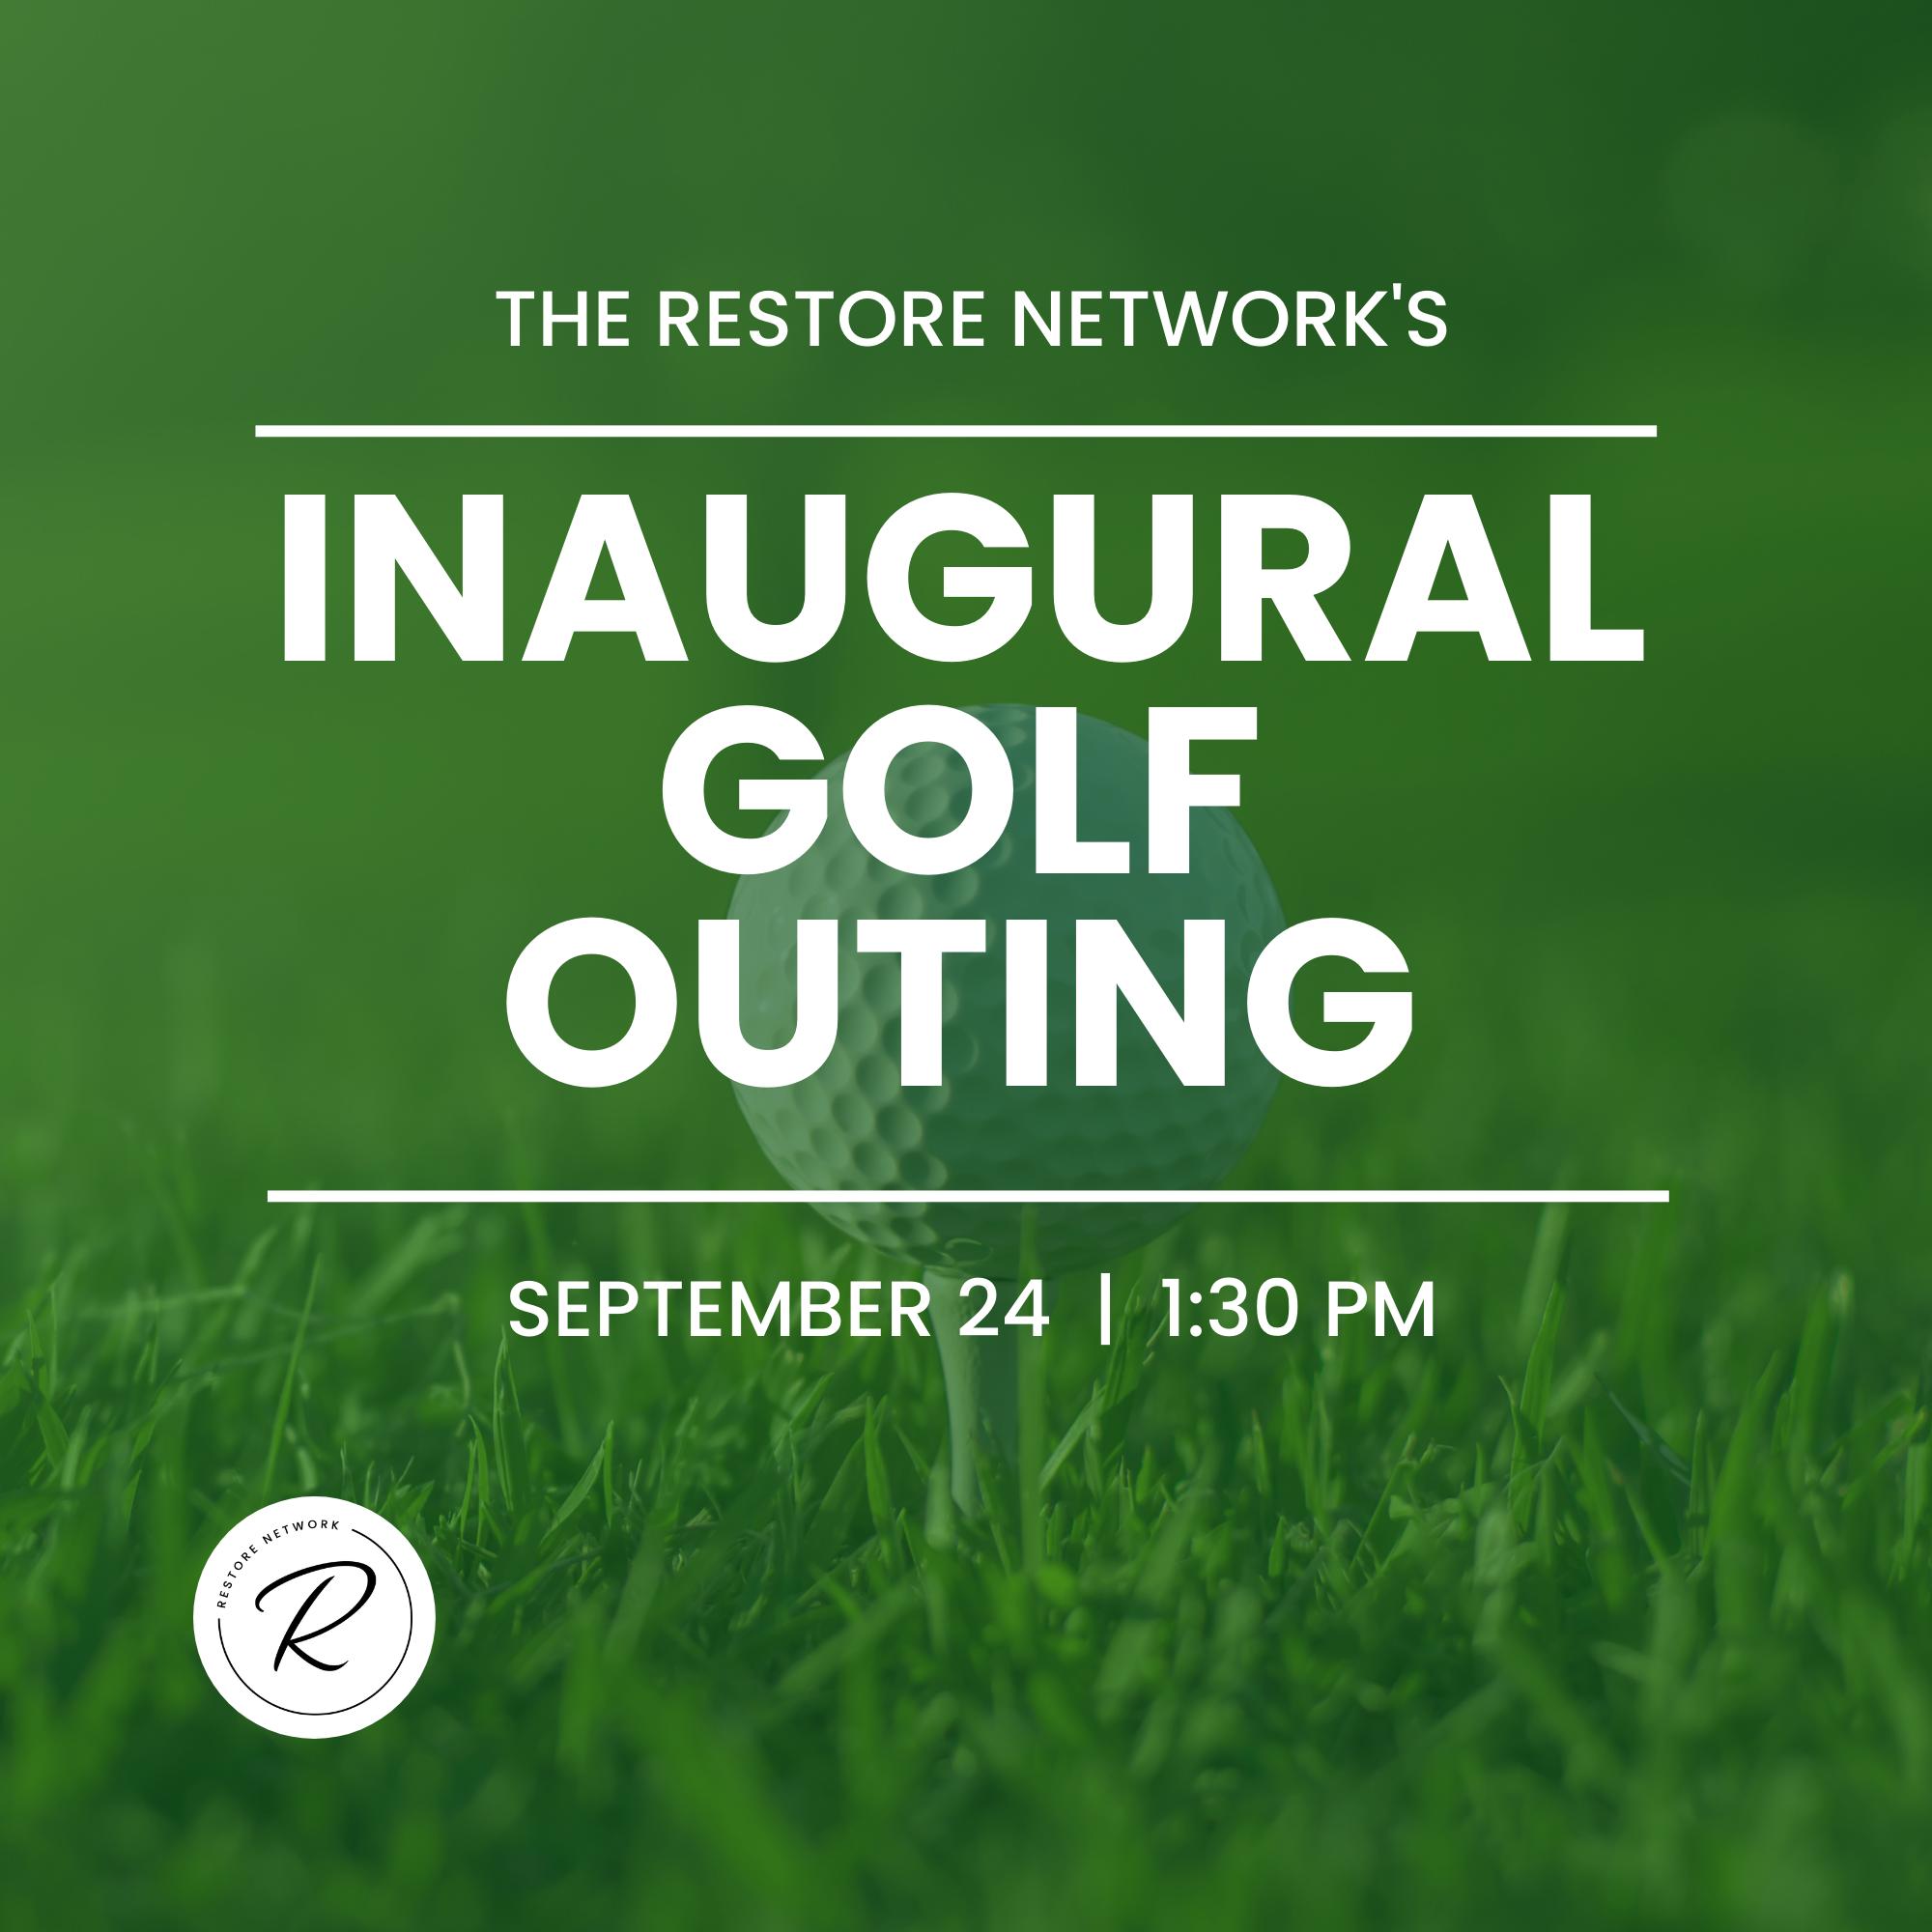 Golf Outing Social Media Image